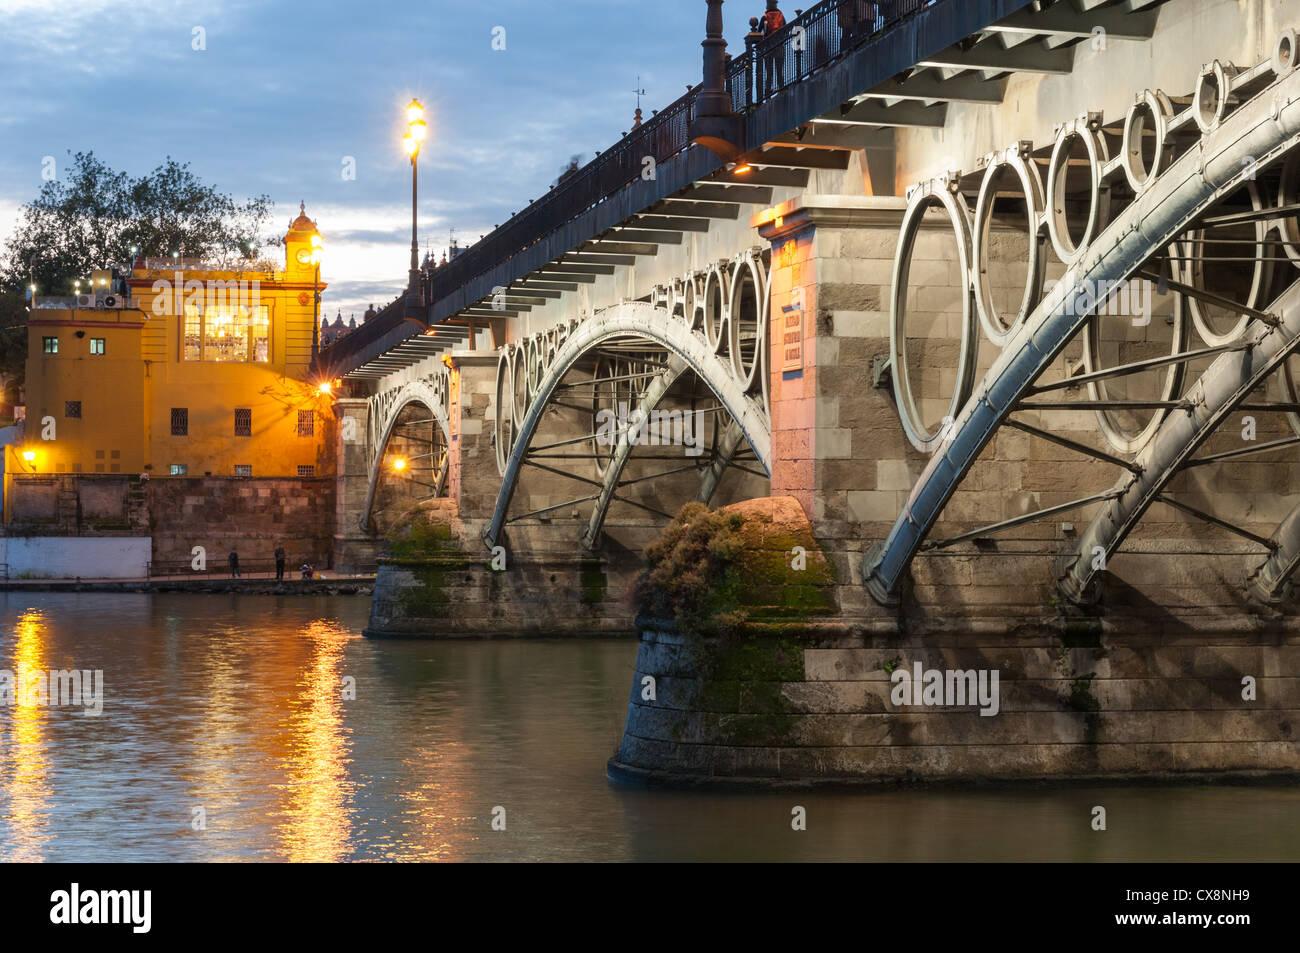 Puente de Triana (de Isabel II) - Seville, Spain - Stock Image